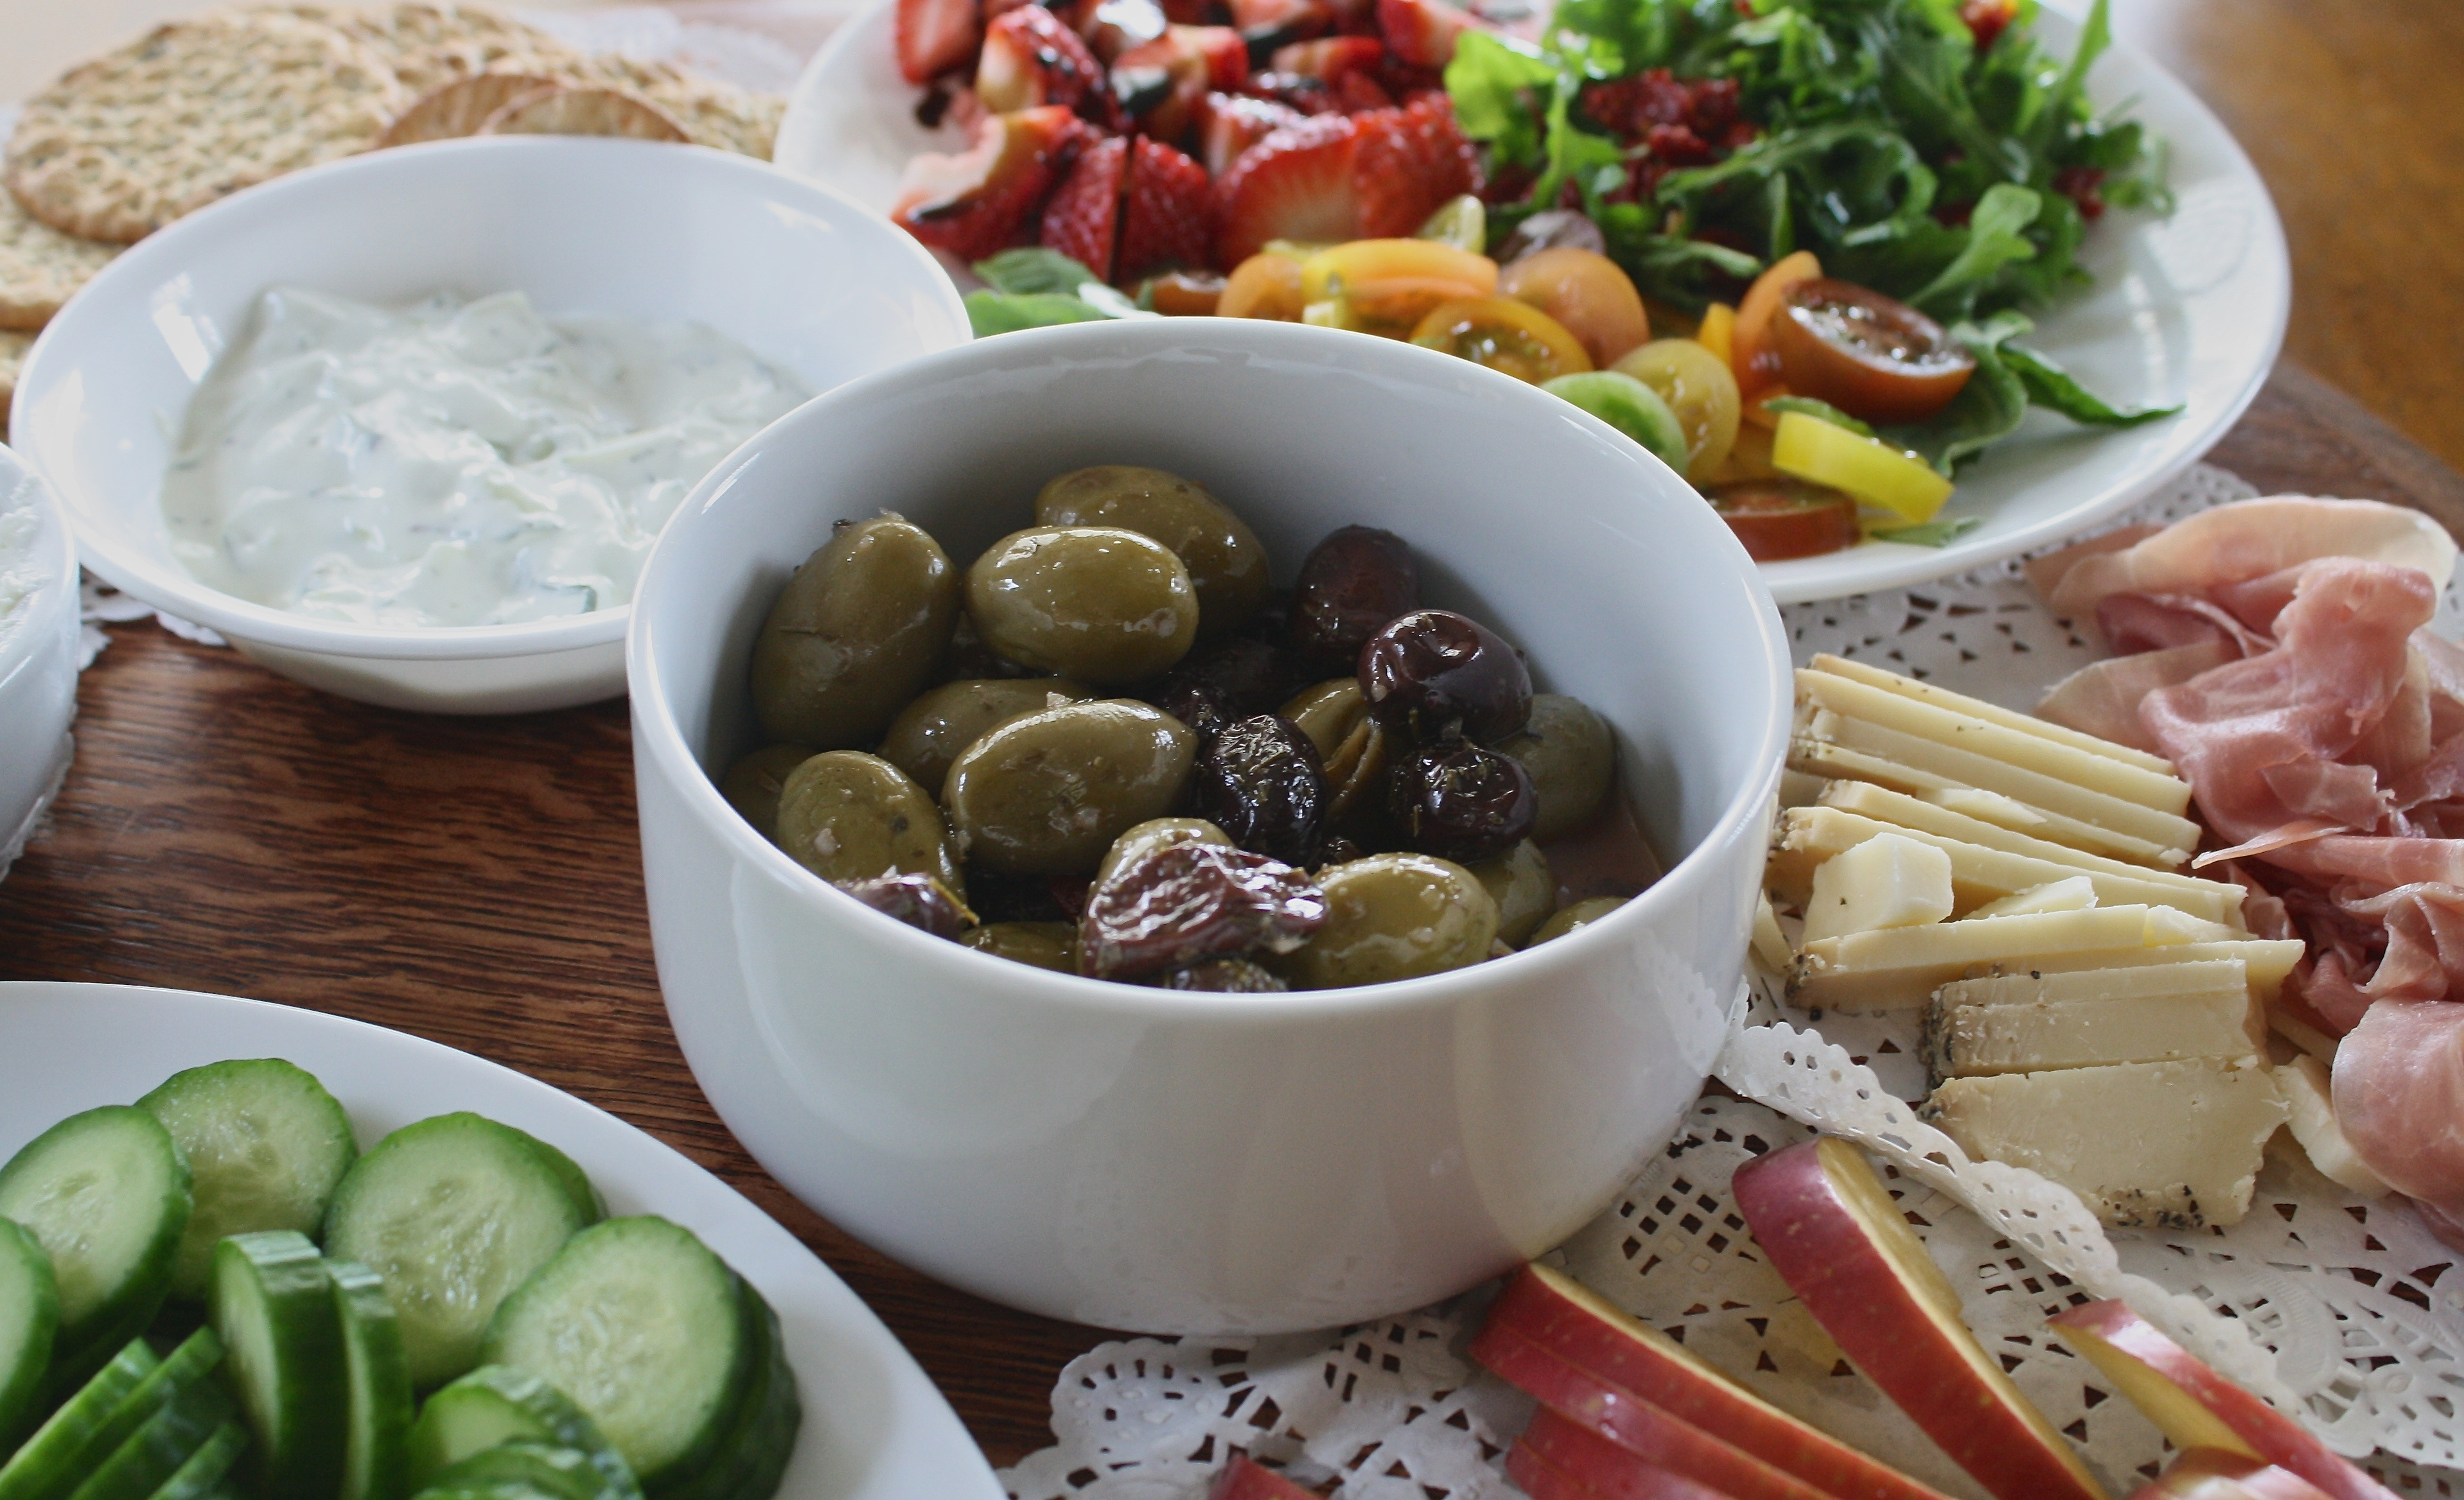 gourmet vegetarian meals - 1200×730